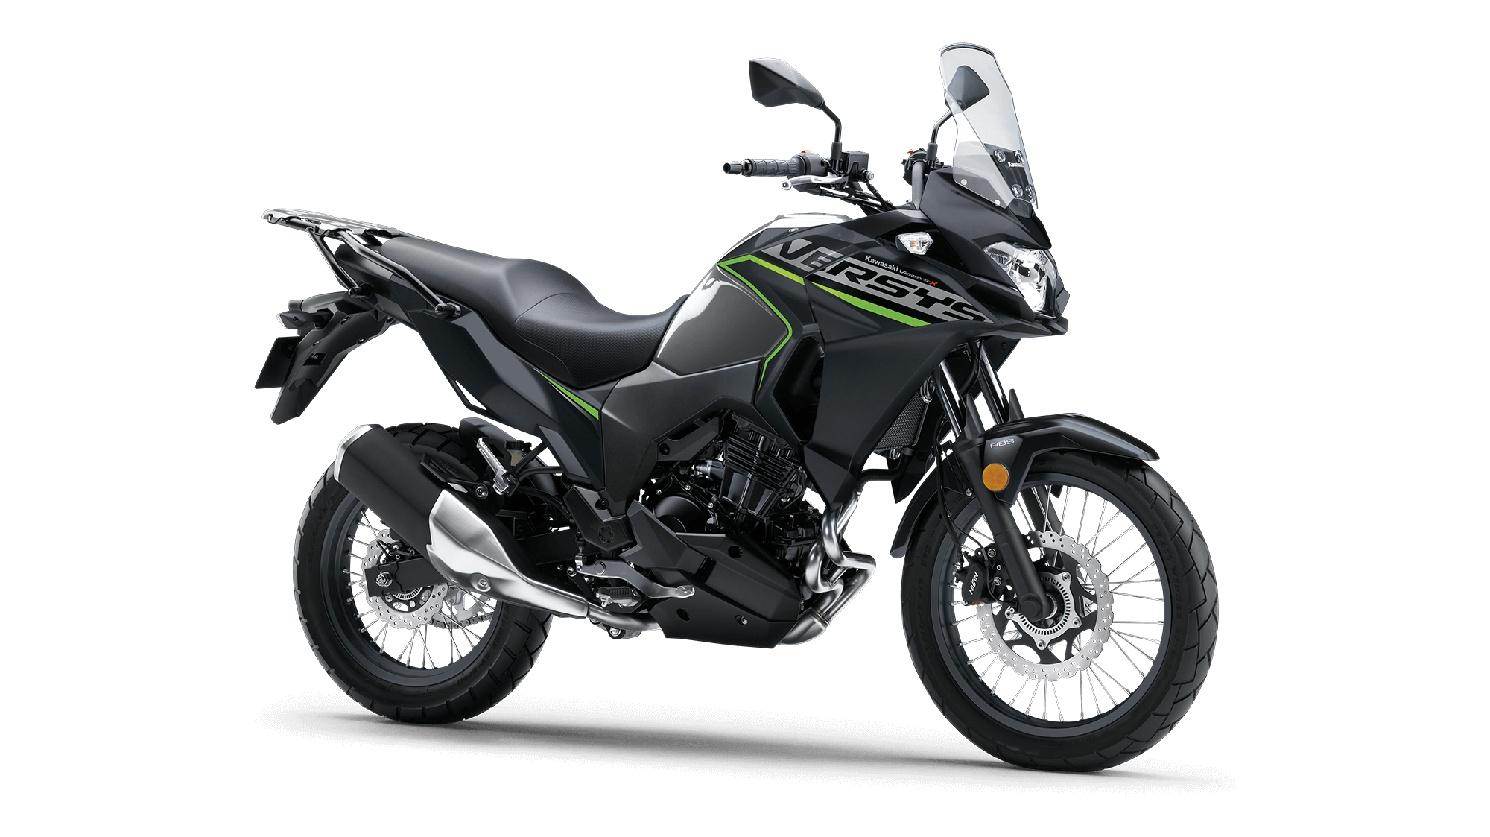 Kawasaki VERSYS-X 300 ABS Gris Poussière D'Étoiles Métallisé/Noir Étincelant Métallisé Mat 2020